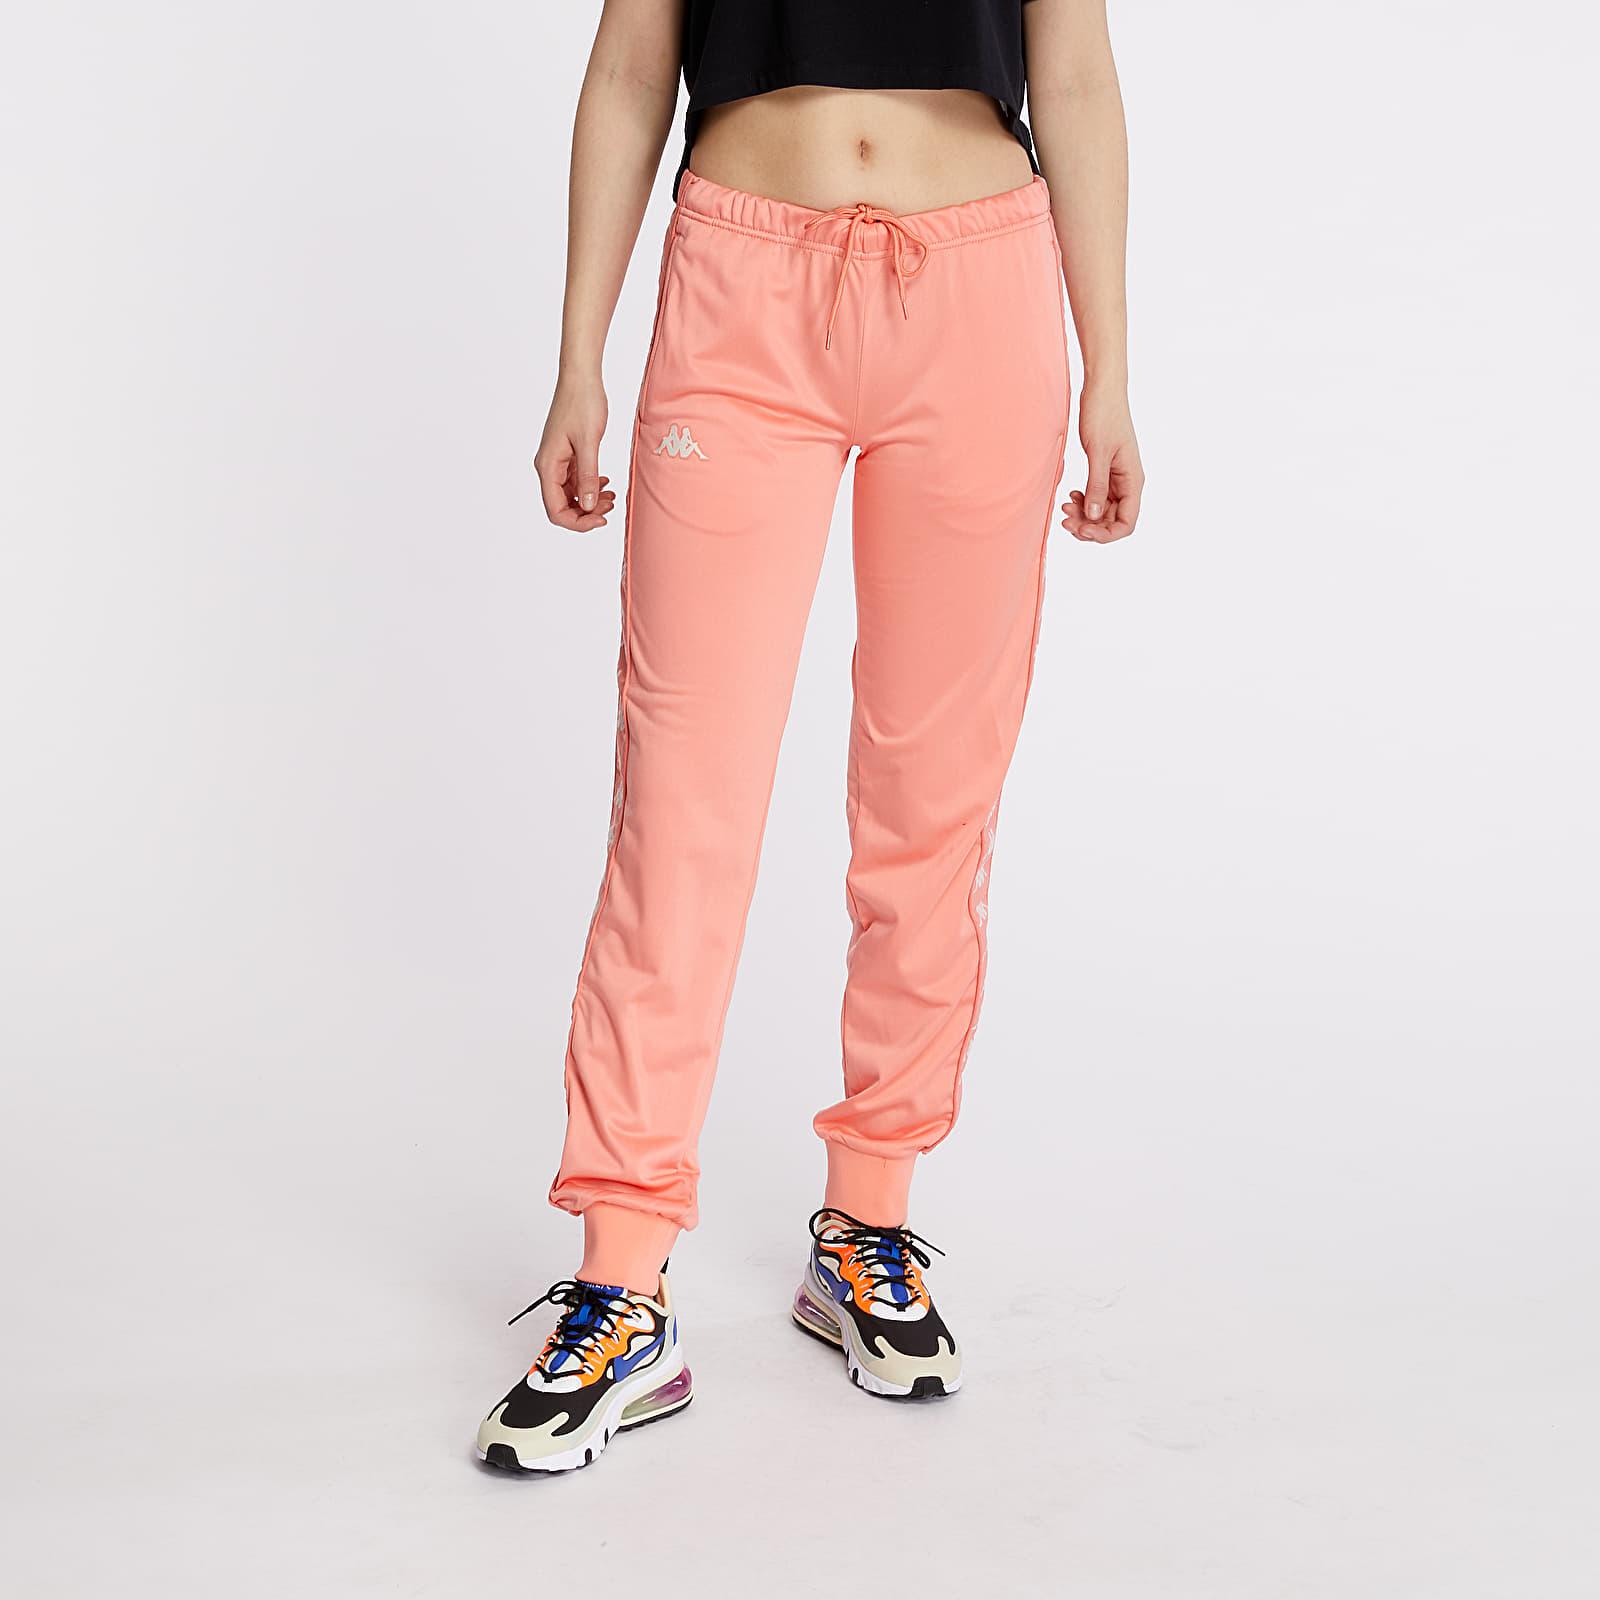 Pants and jeans Kappa 222 Banda Wrastoria Slim Pants Pink/ White